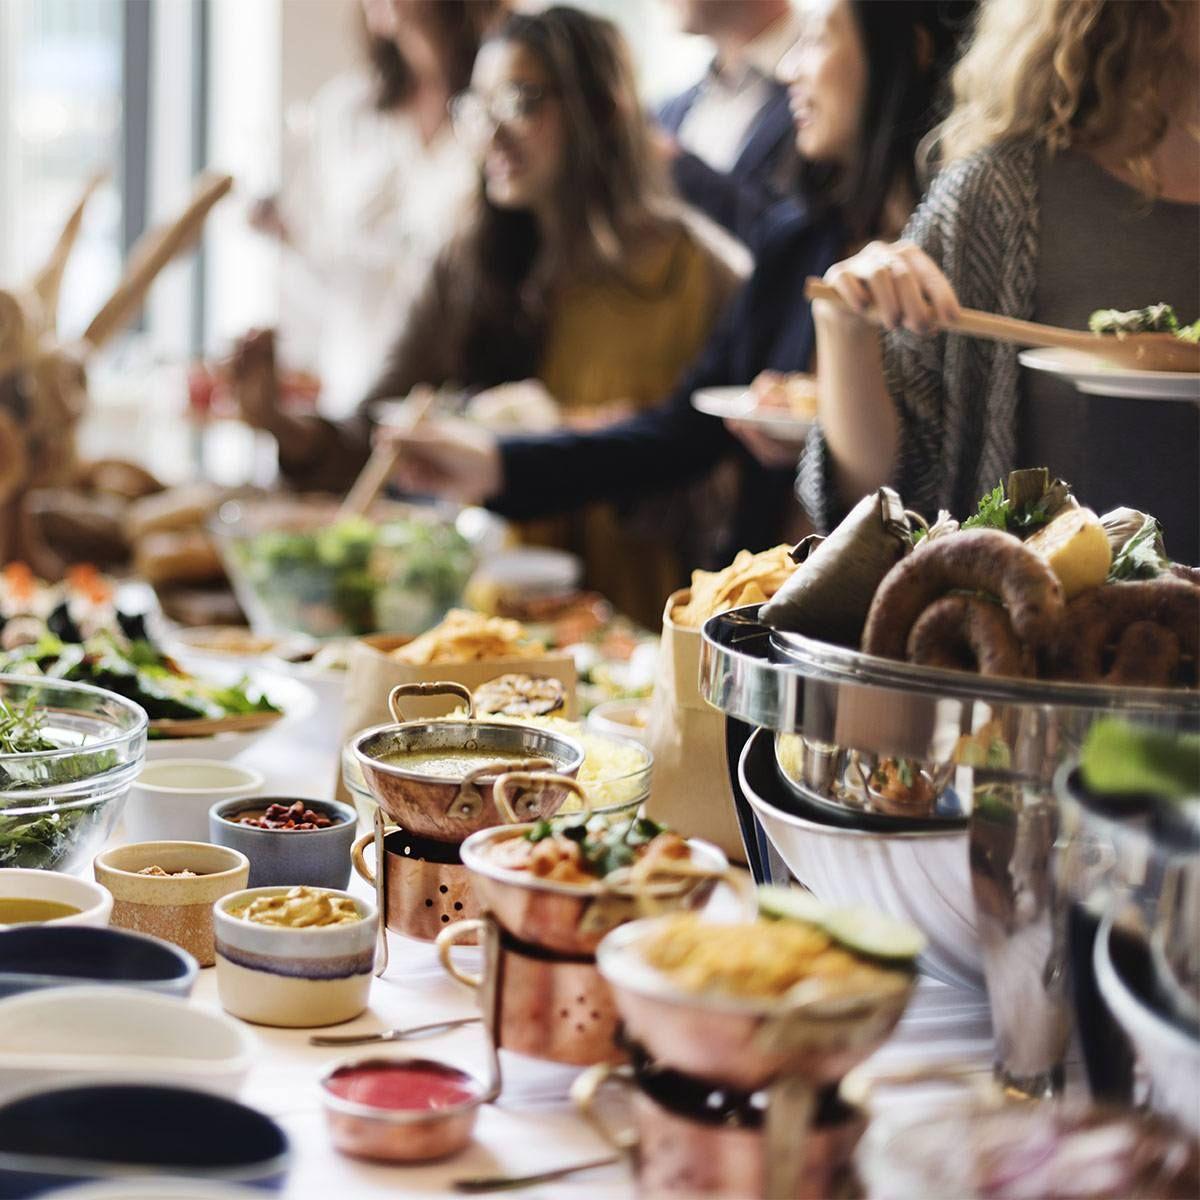 Asian Wedding Food Caterers: Manger, Pour Maigrir, Buffet Alimentaire